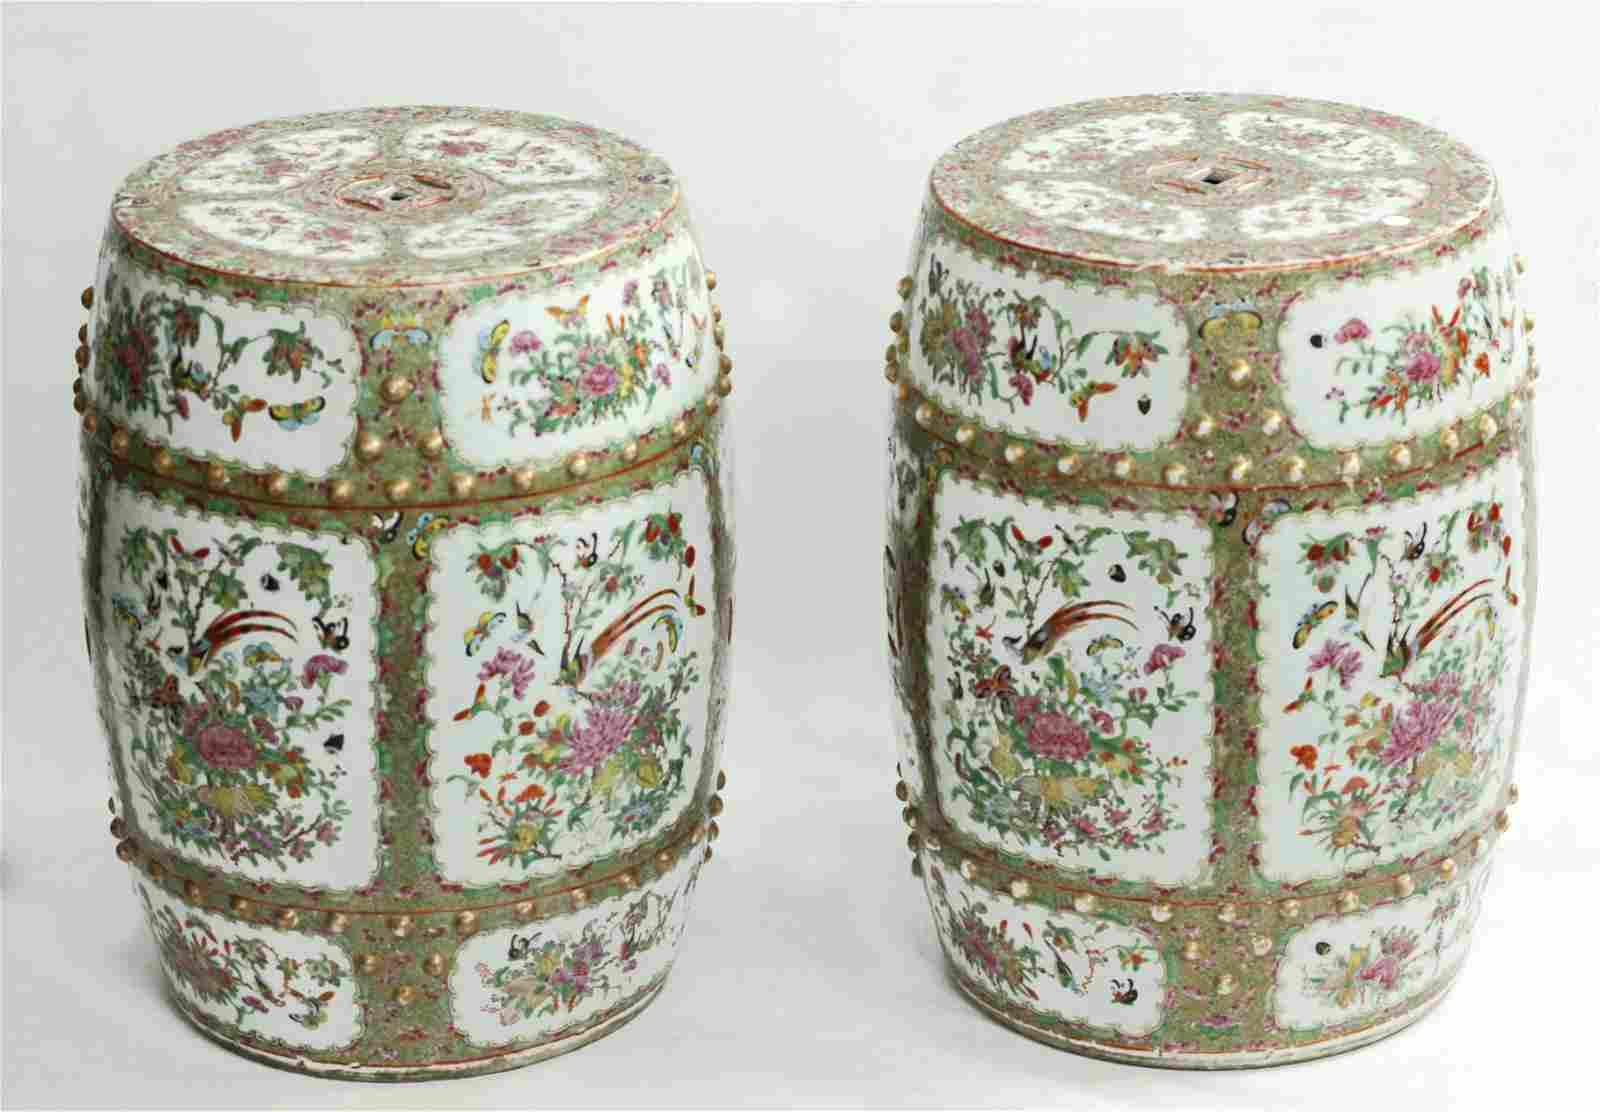 Pr Chinese 19 C Medallion Porcelain Garden Seats